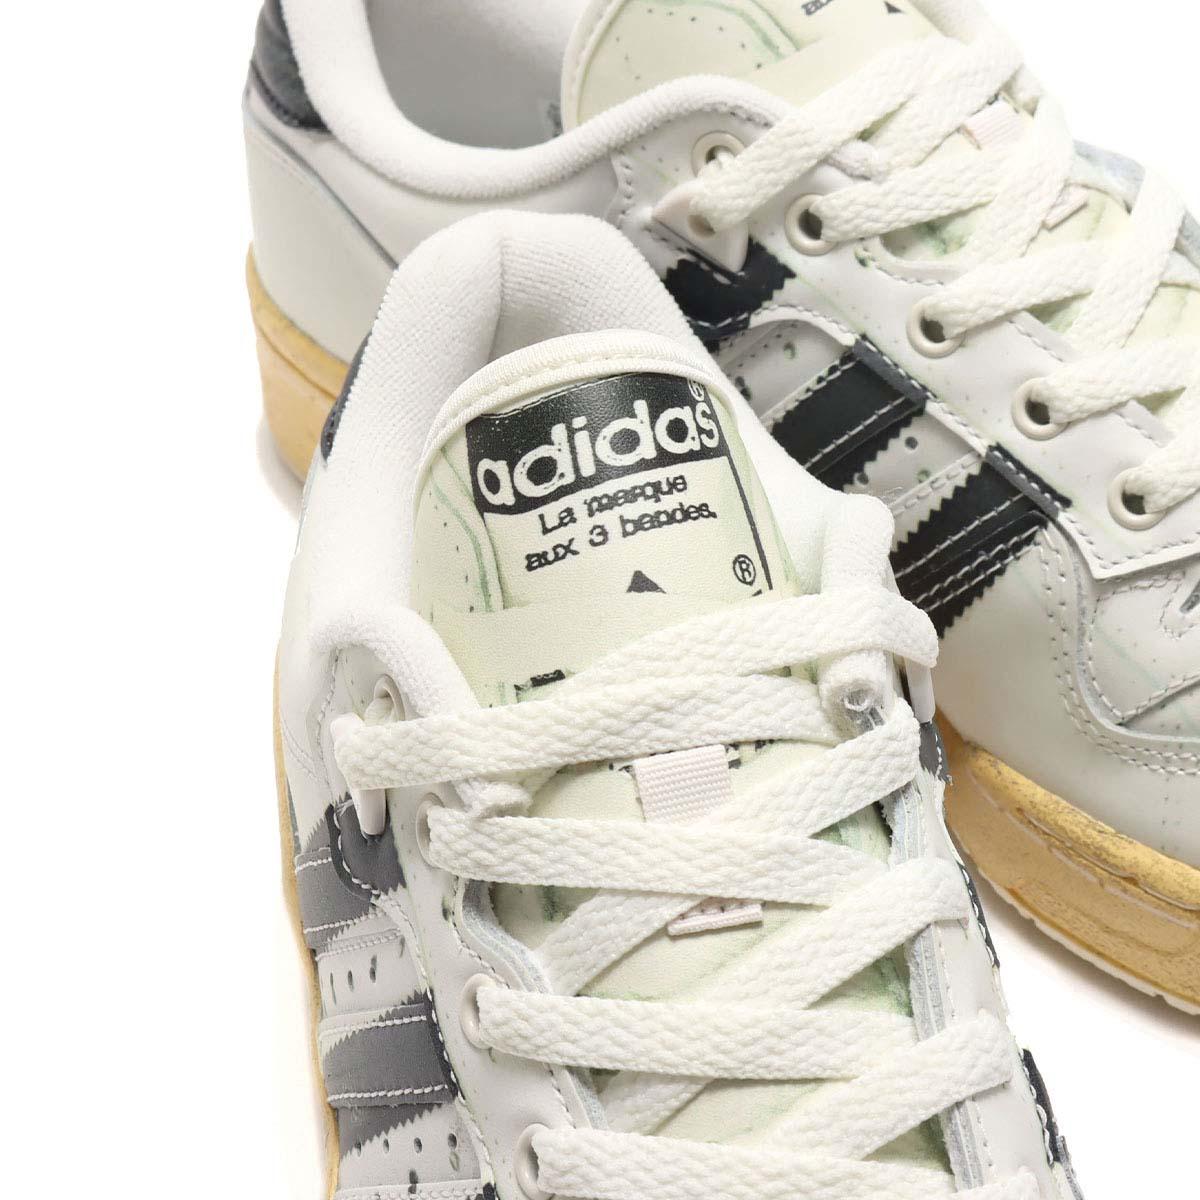 adidas RIVALRY LO / SUPER RIVALRY FOOTWEAR WHITE / CORE BLACK / OFF WHITE FW6094 アディダス ライバルリー ロー / スーパーライバルリー ホワイト/ブラック